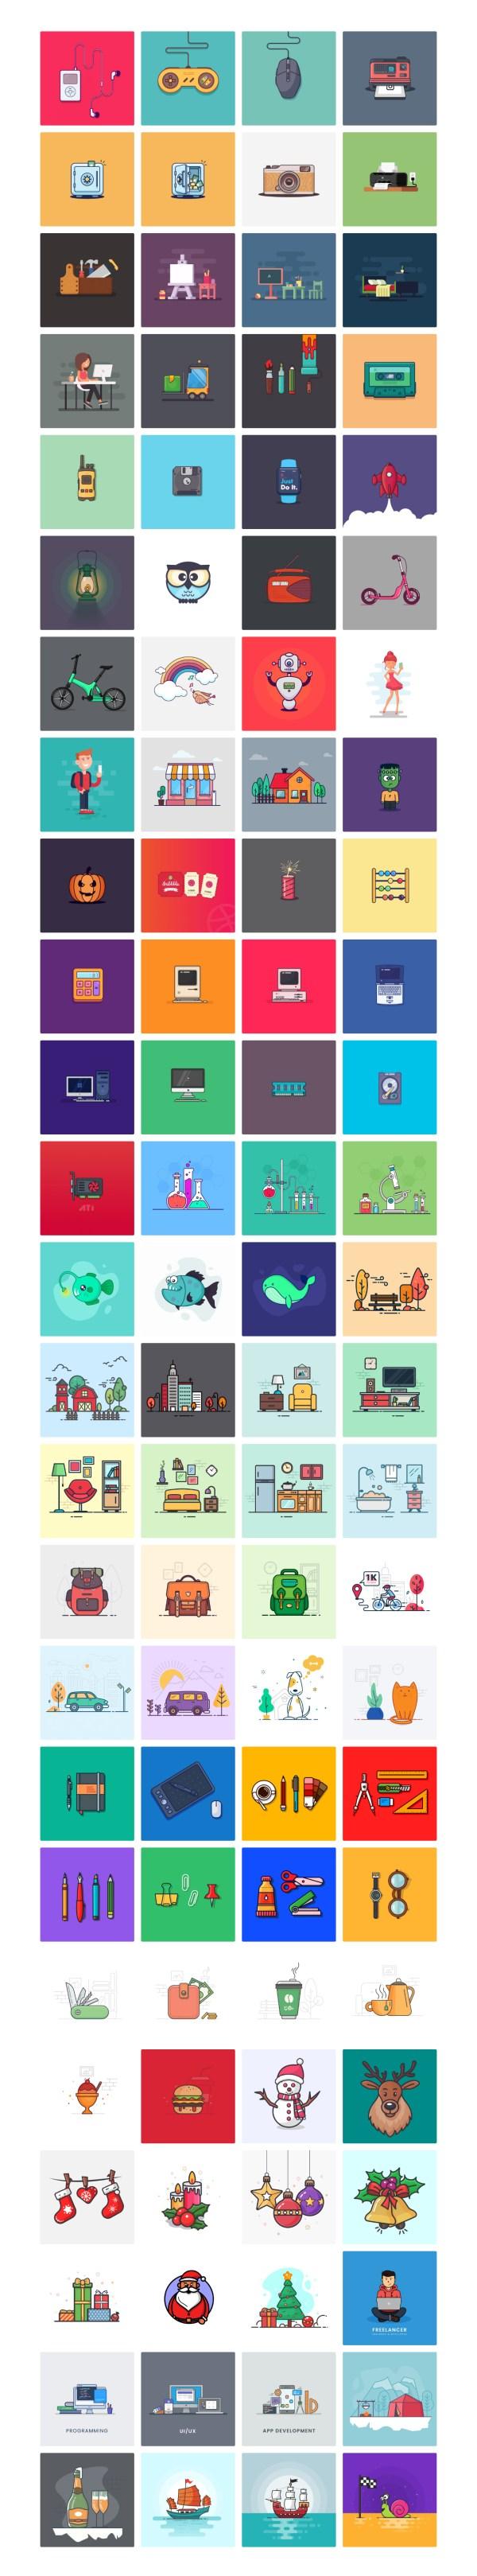 Illlustrations - Open Source Illustrations Kit